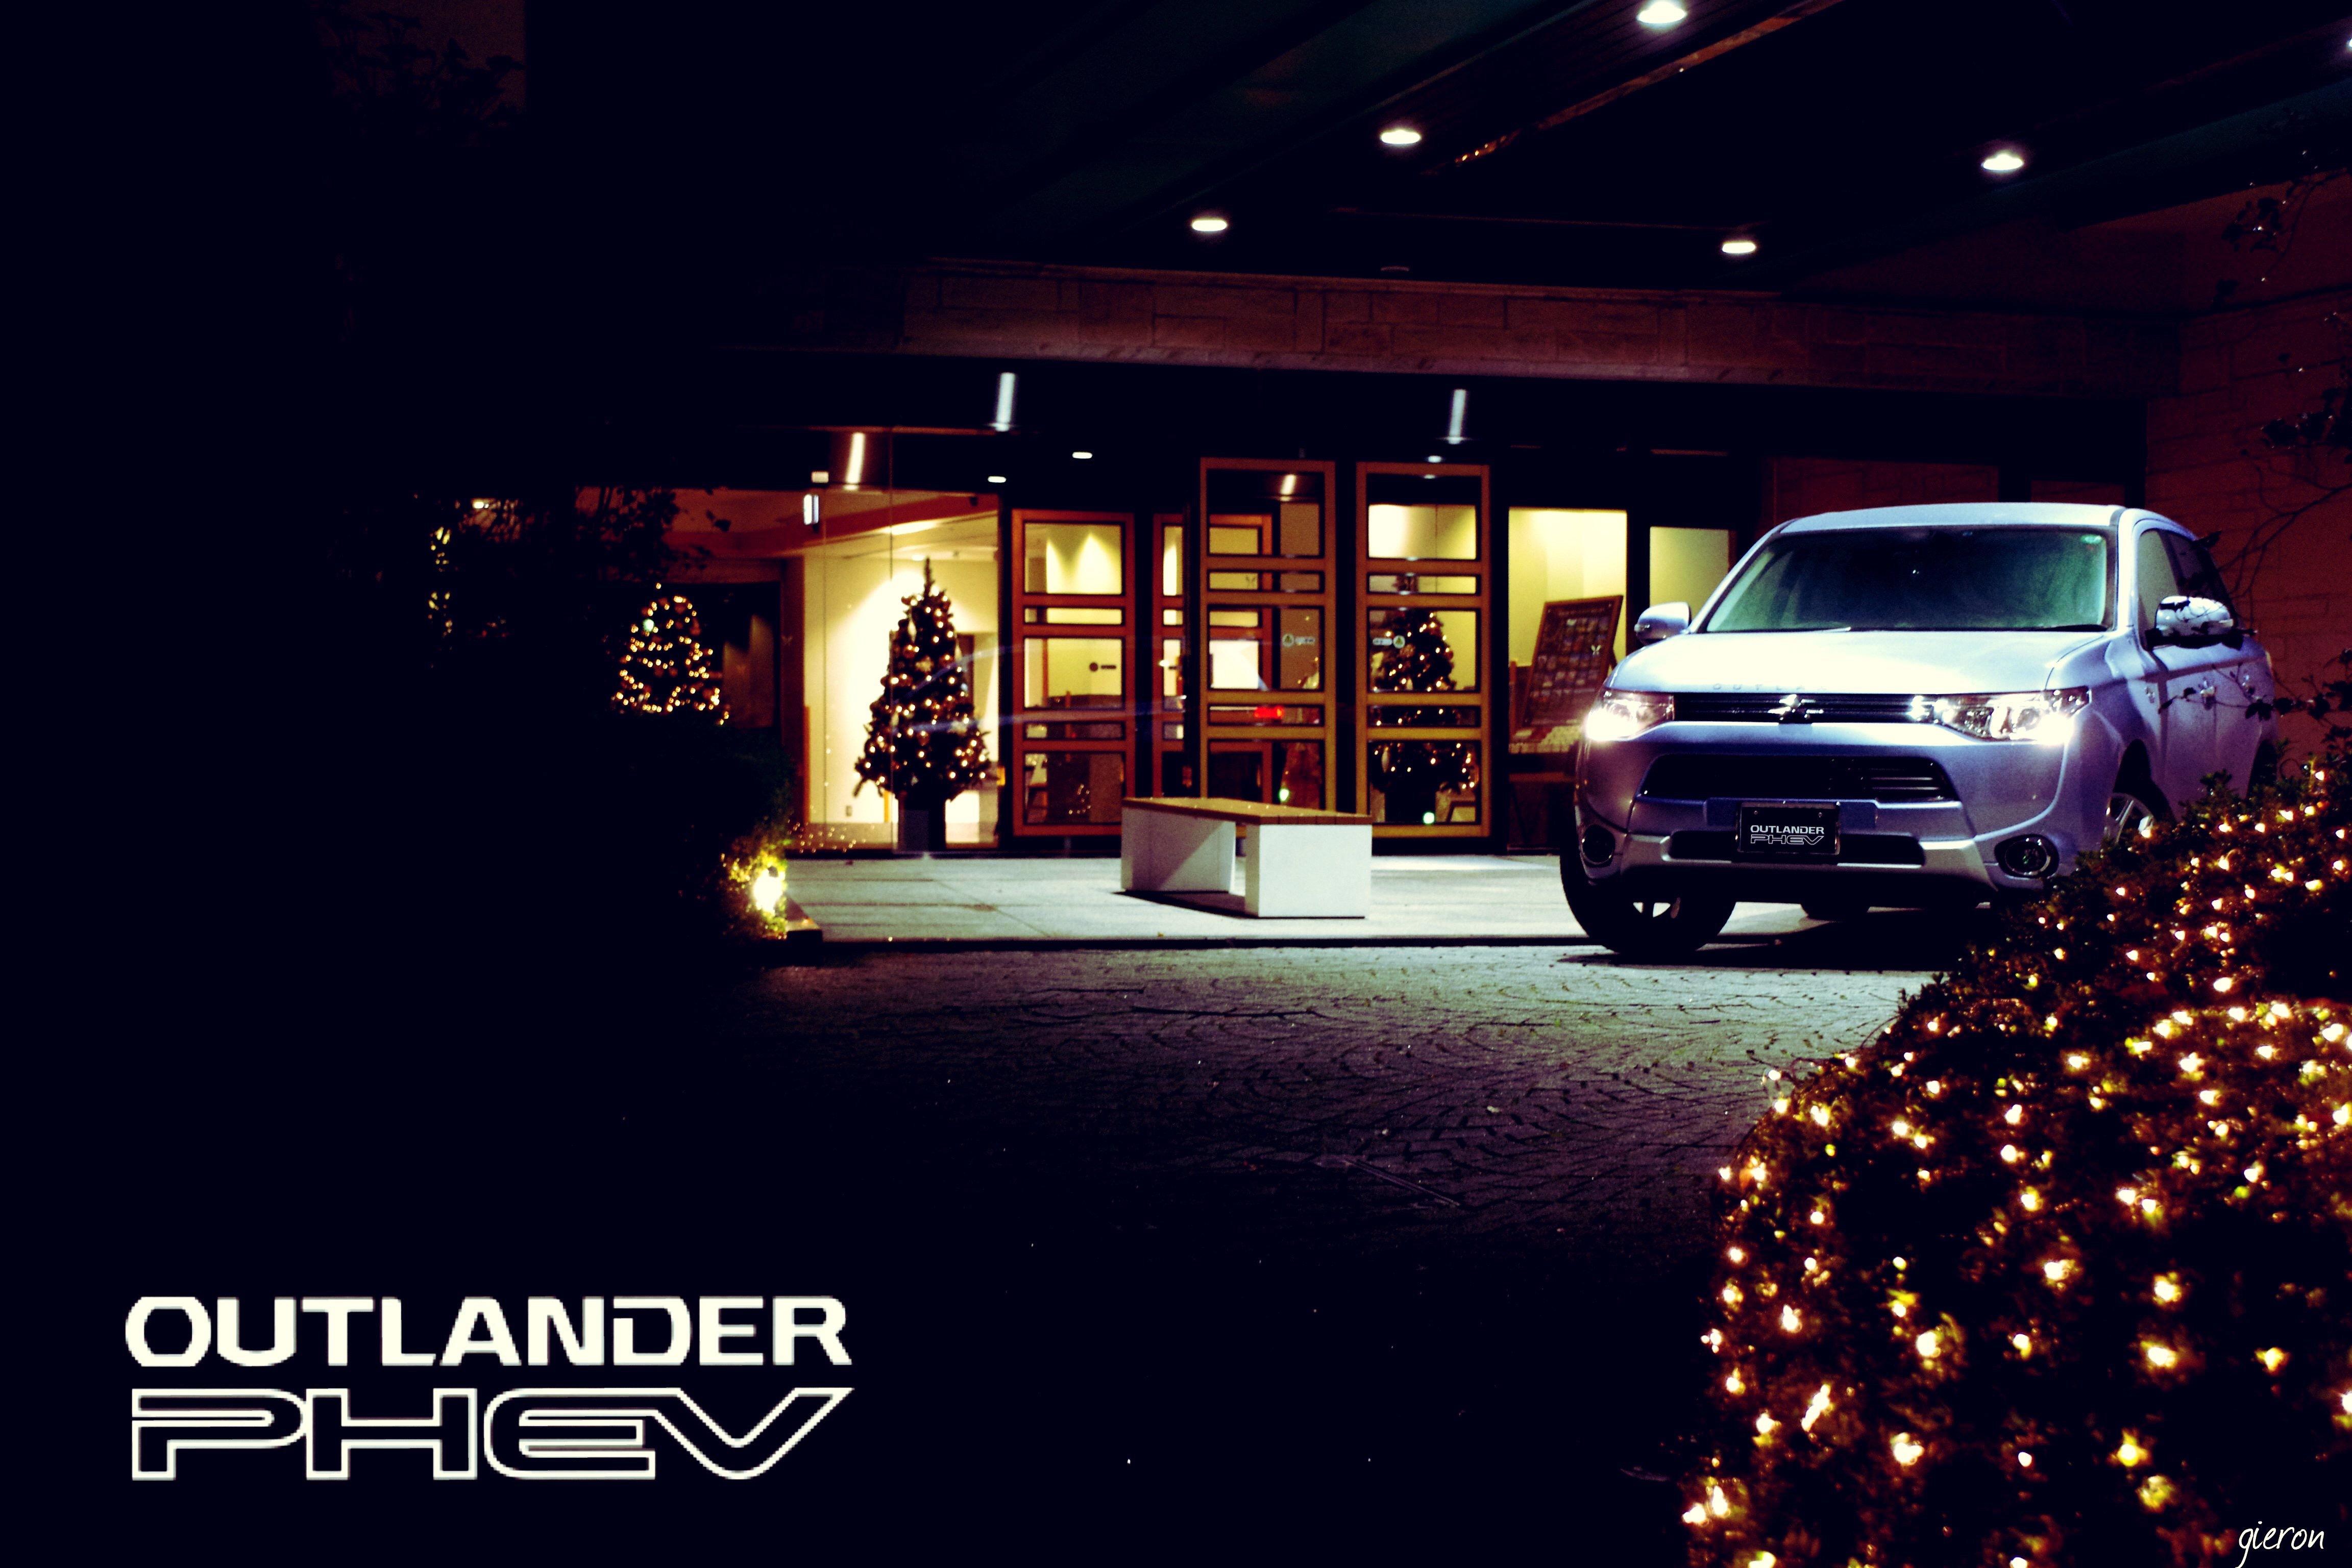 Mitsubishi Outlander PHEV in xmas 2016 アウトランダーPHEV クリスマス